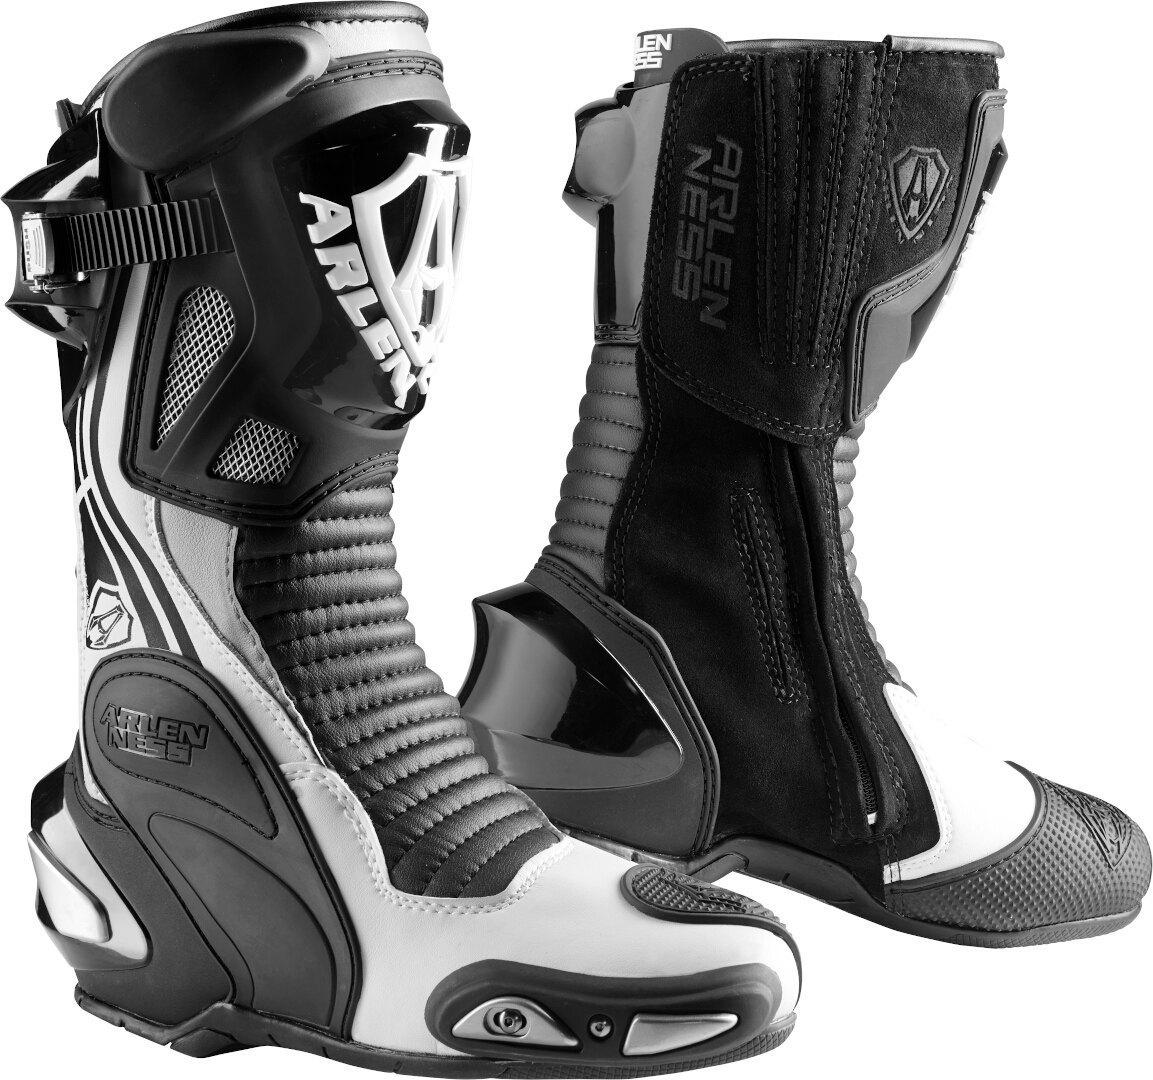 Arlen Ness Pro Shift 2 Motorradstiefel, schwarz-grau-weiss, Größe 40, schwarz-grau-weiss, Größe 40